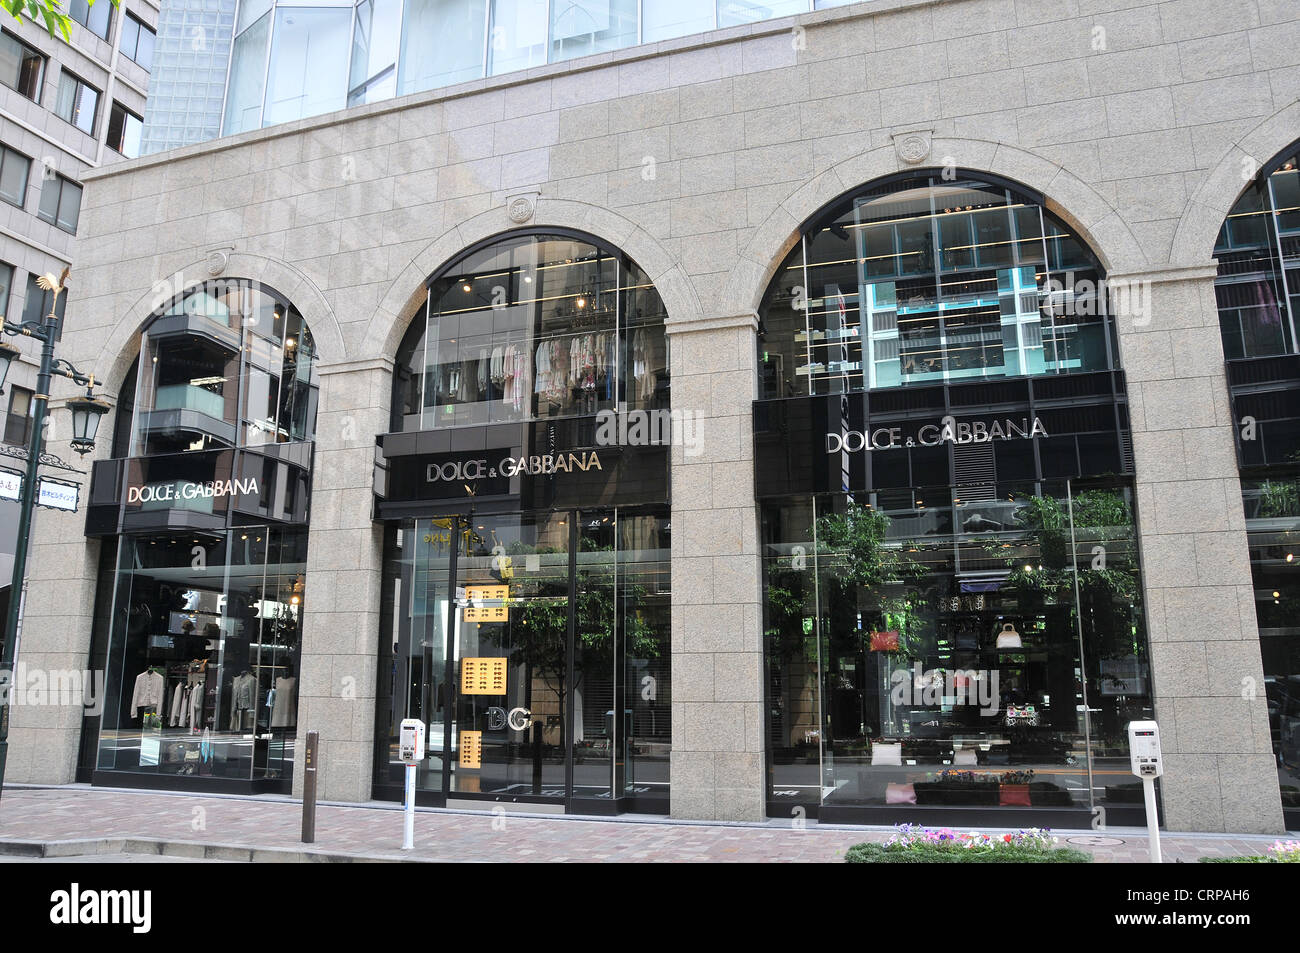 Dolce   Gabbana boutique Ginza Tokyo Japan Stock Photo  49049090 - Alamy 926107b8608